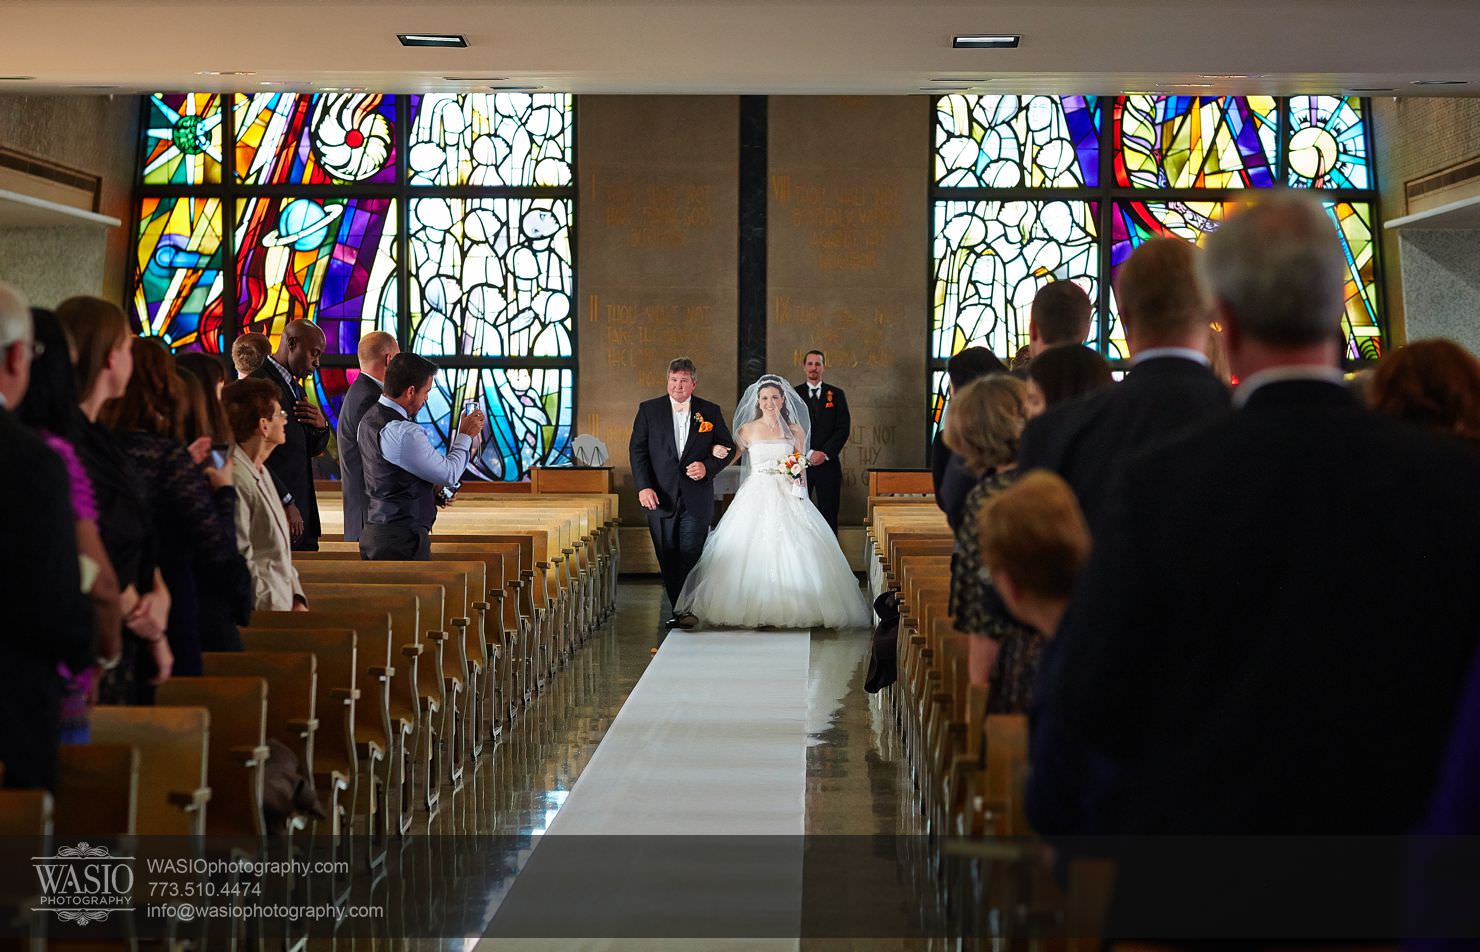 Rosemont-Fall-Wedding-Lauren-and-David-012 Rosemont Fall Wedding - Lauren + David